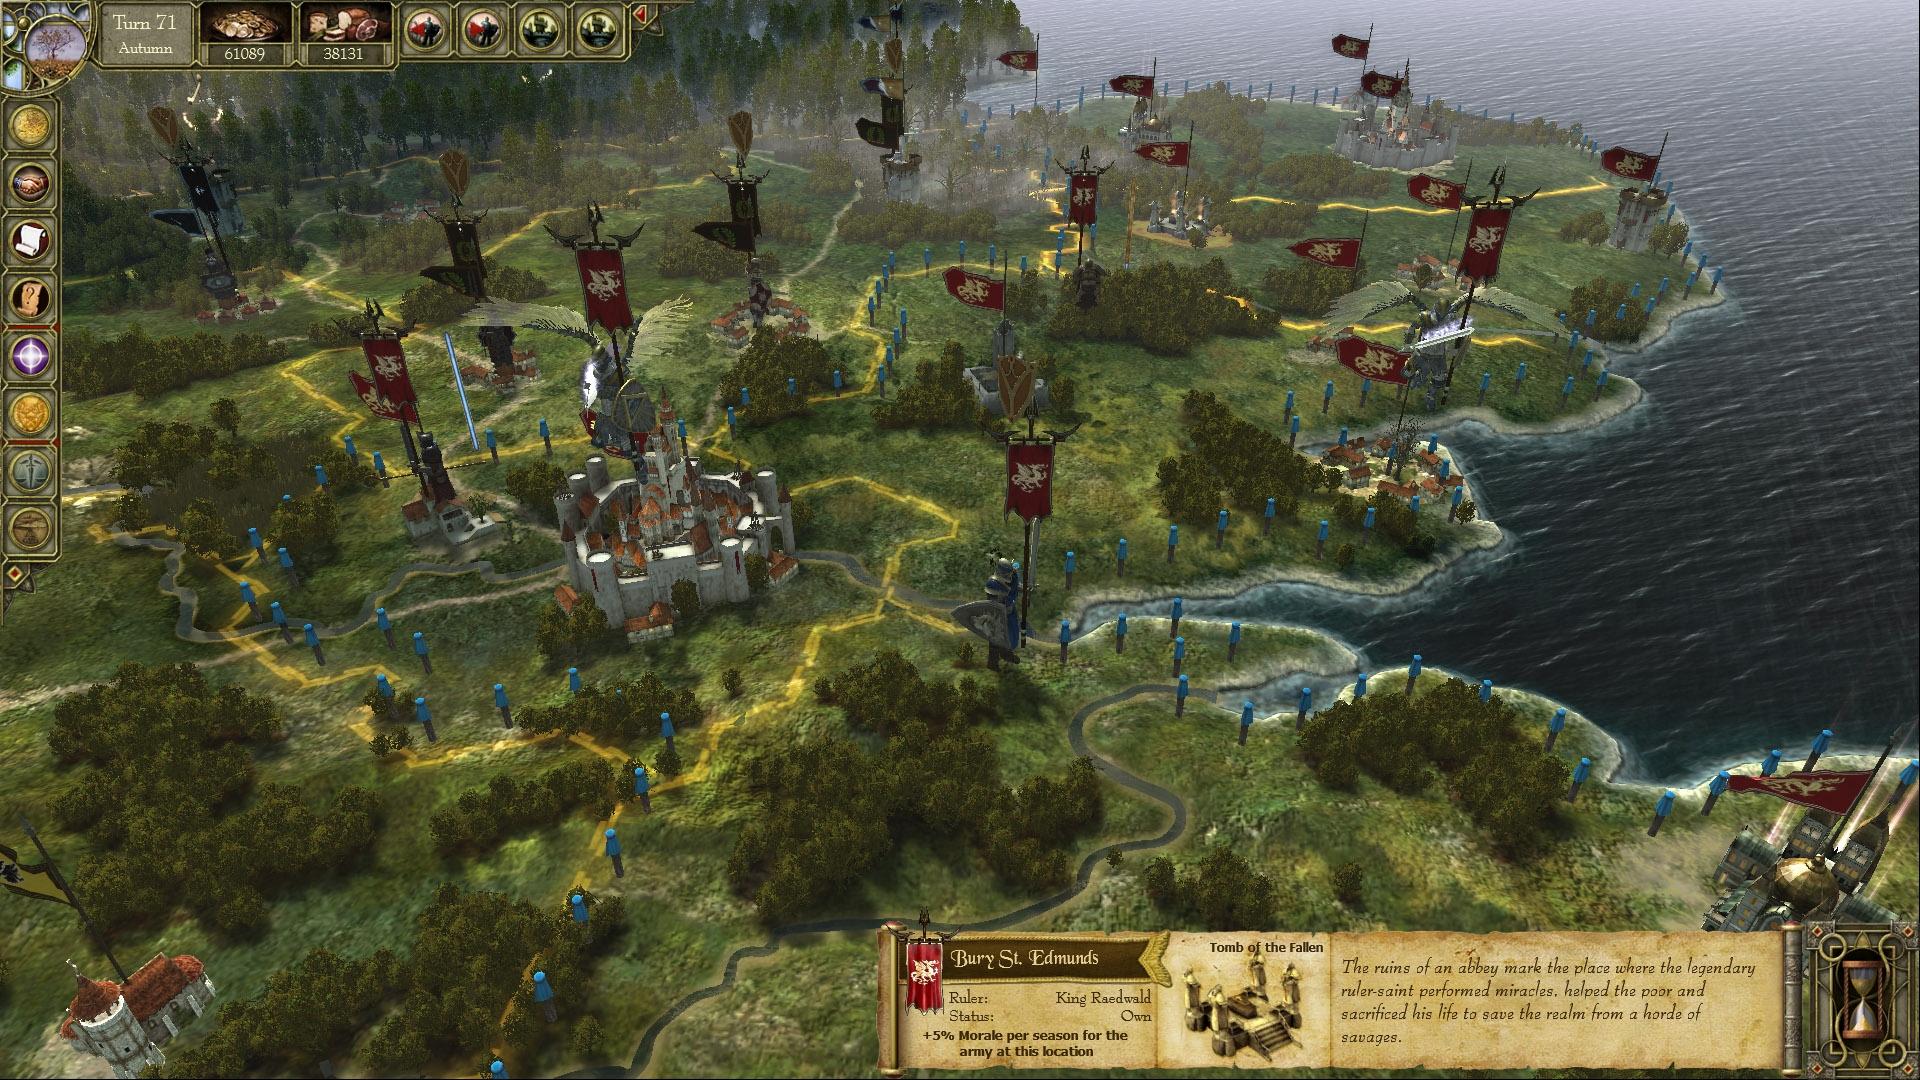 King Arthur Collection | ROW (9f6db56e-23db-499c-bdd9-6a55ea7bf5a8)